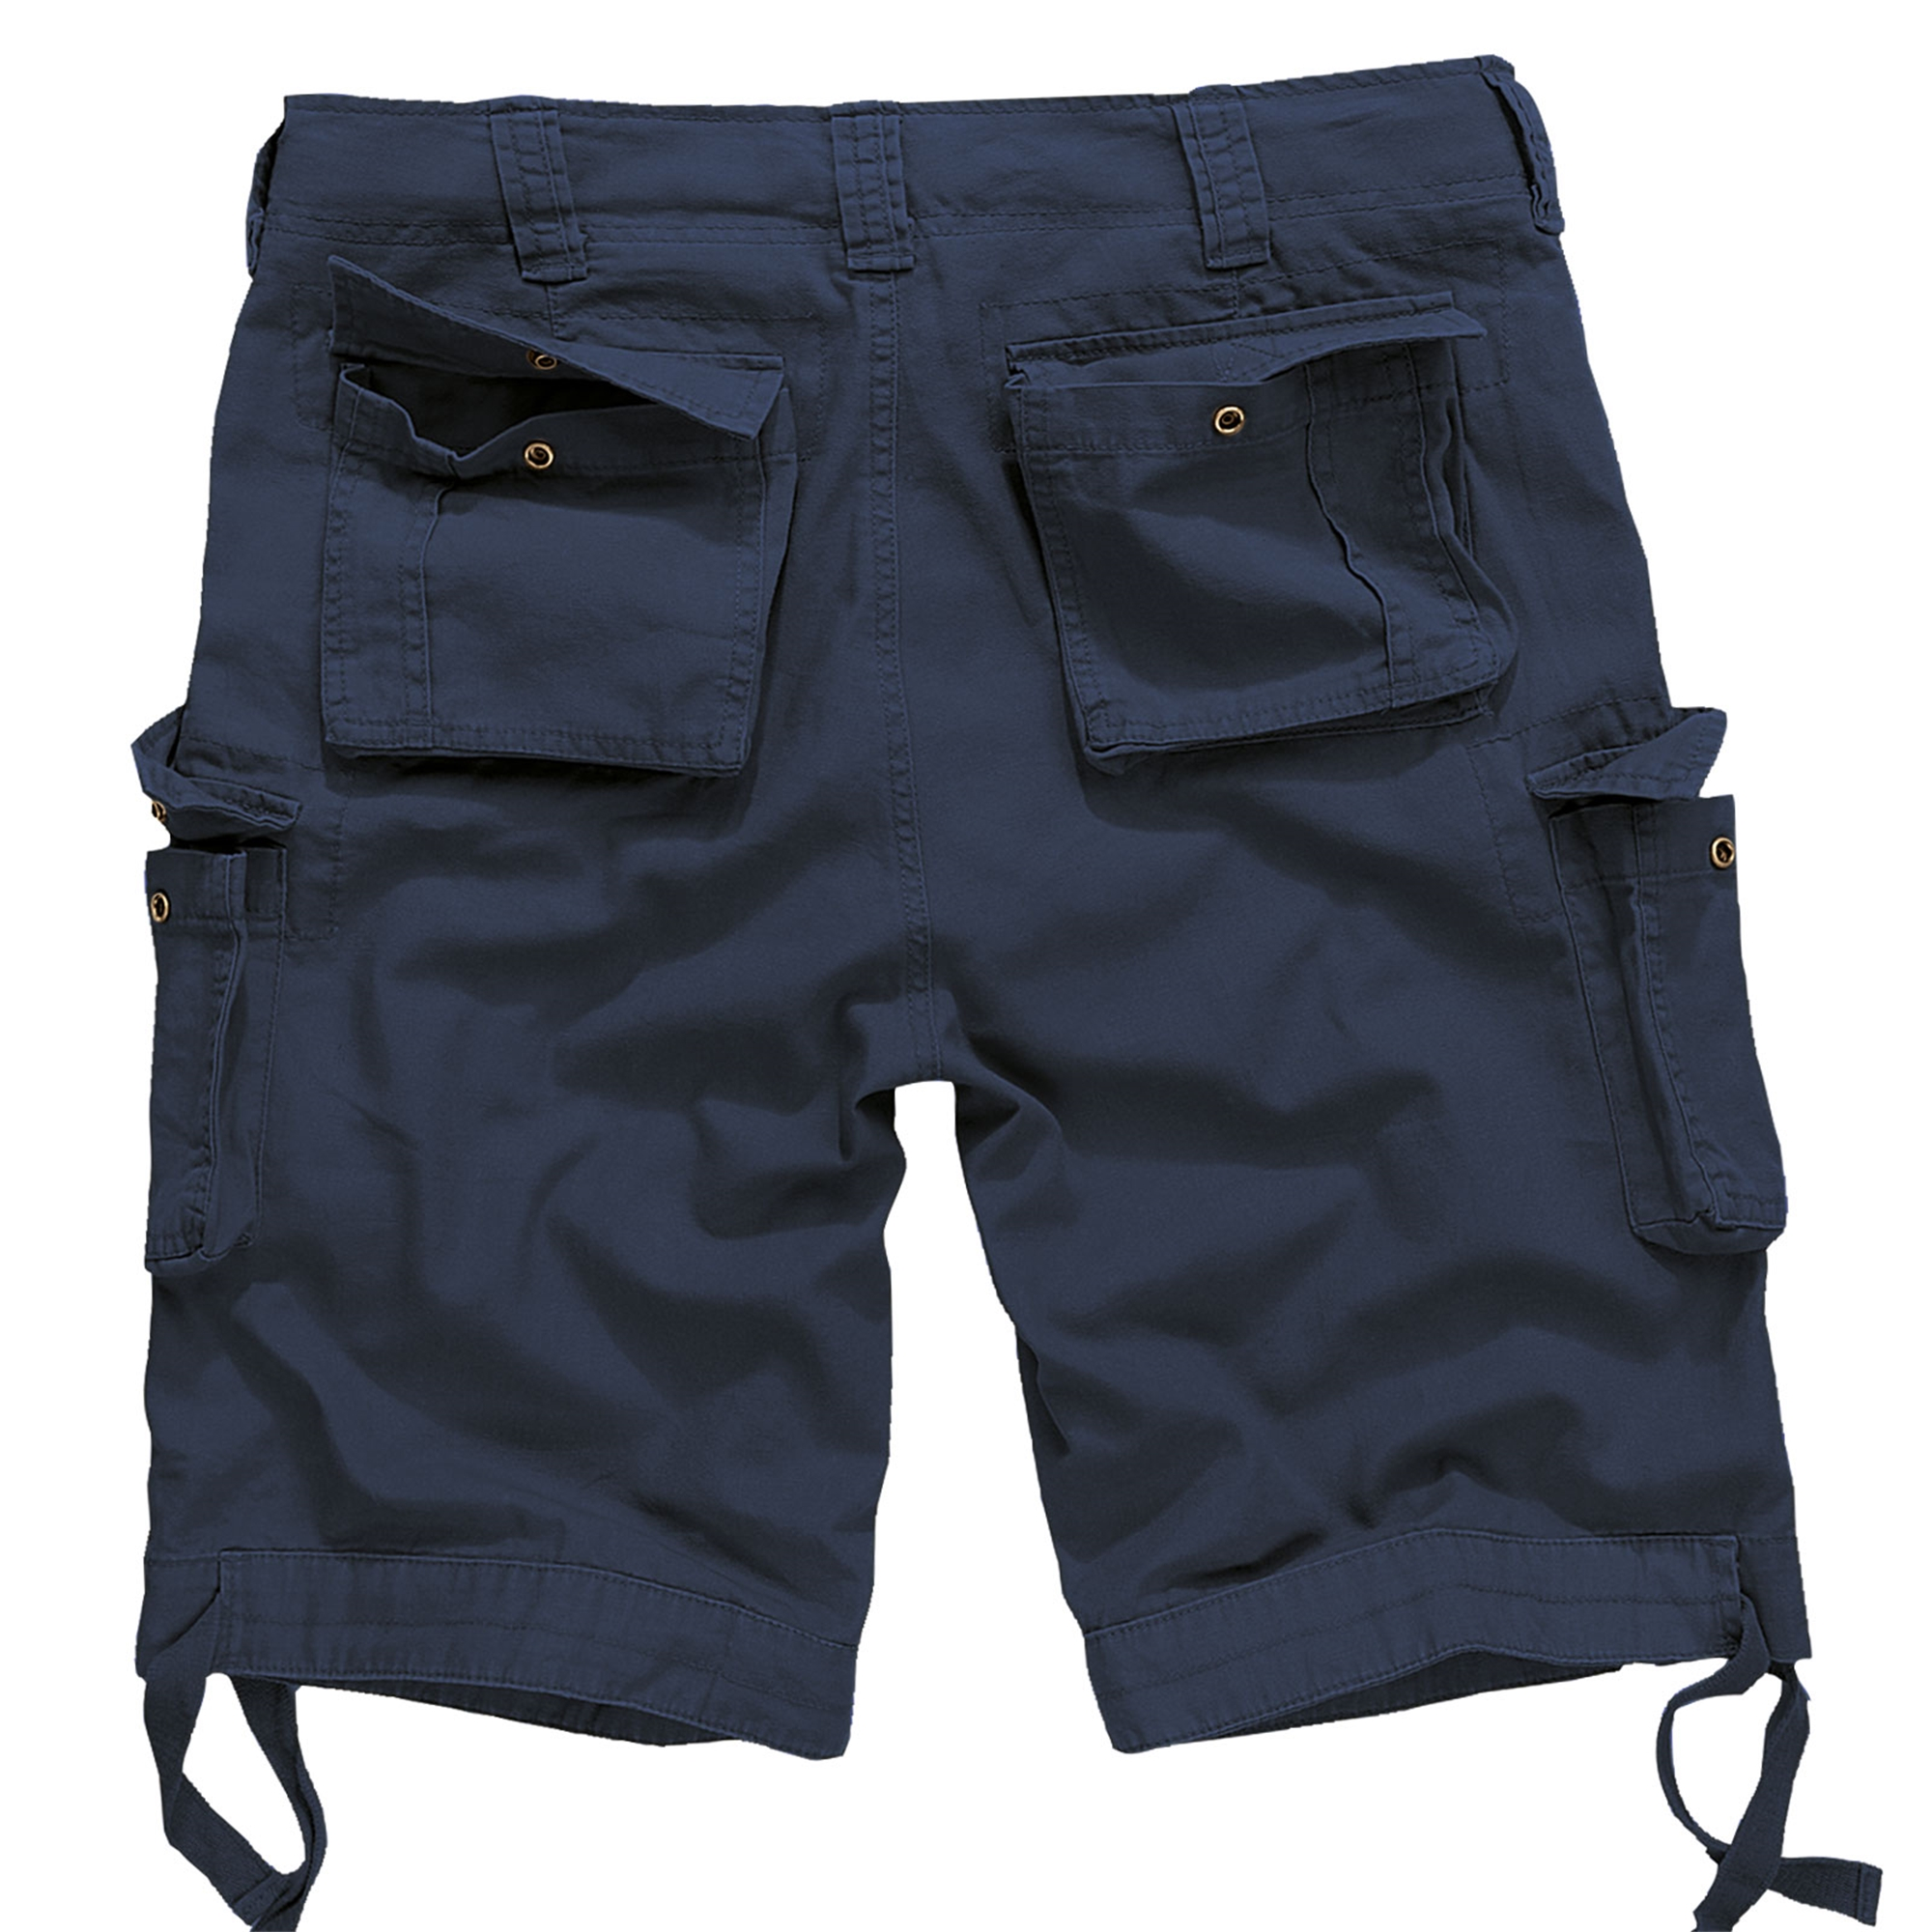 Brandit-Urban-Legend-Herren-Cargo-Shorts-Bermuda-Kurze-Hose-Short-US-Army Indexbild 18